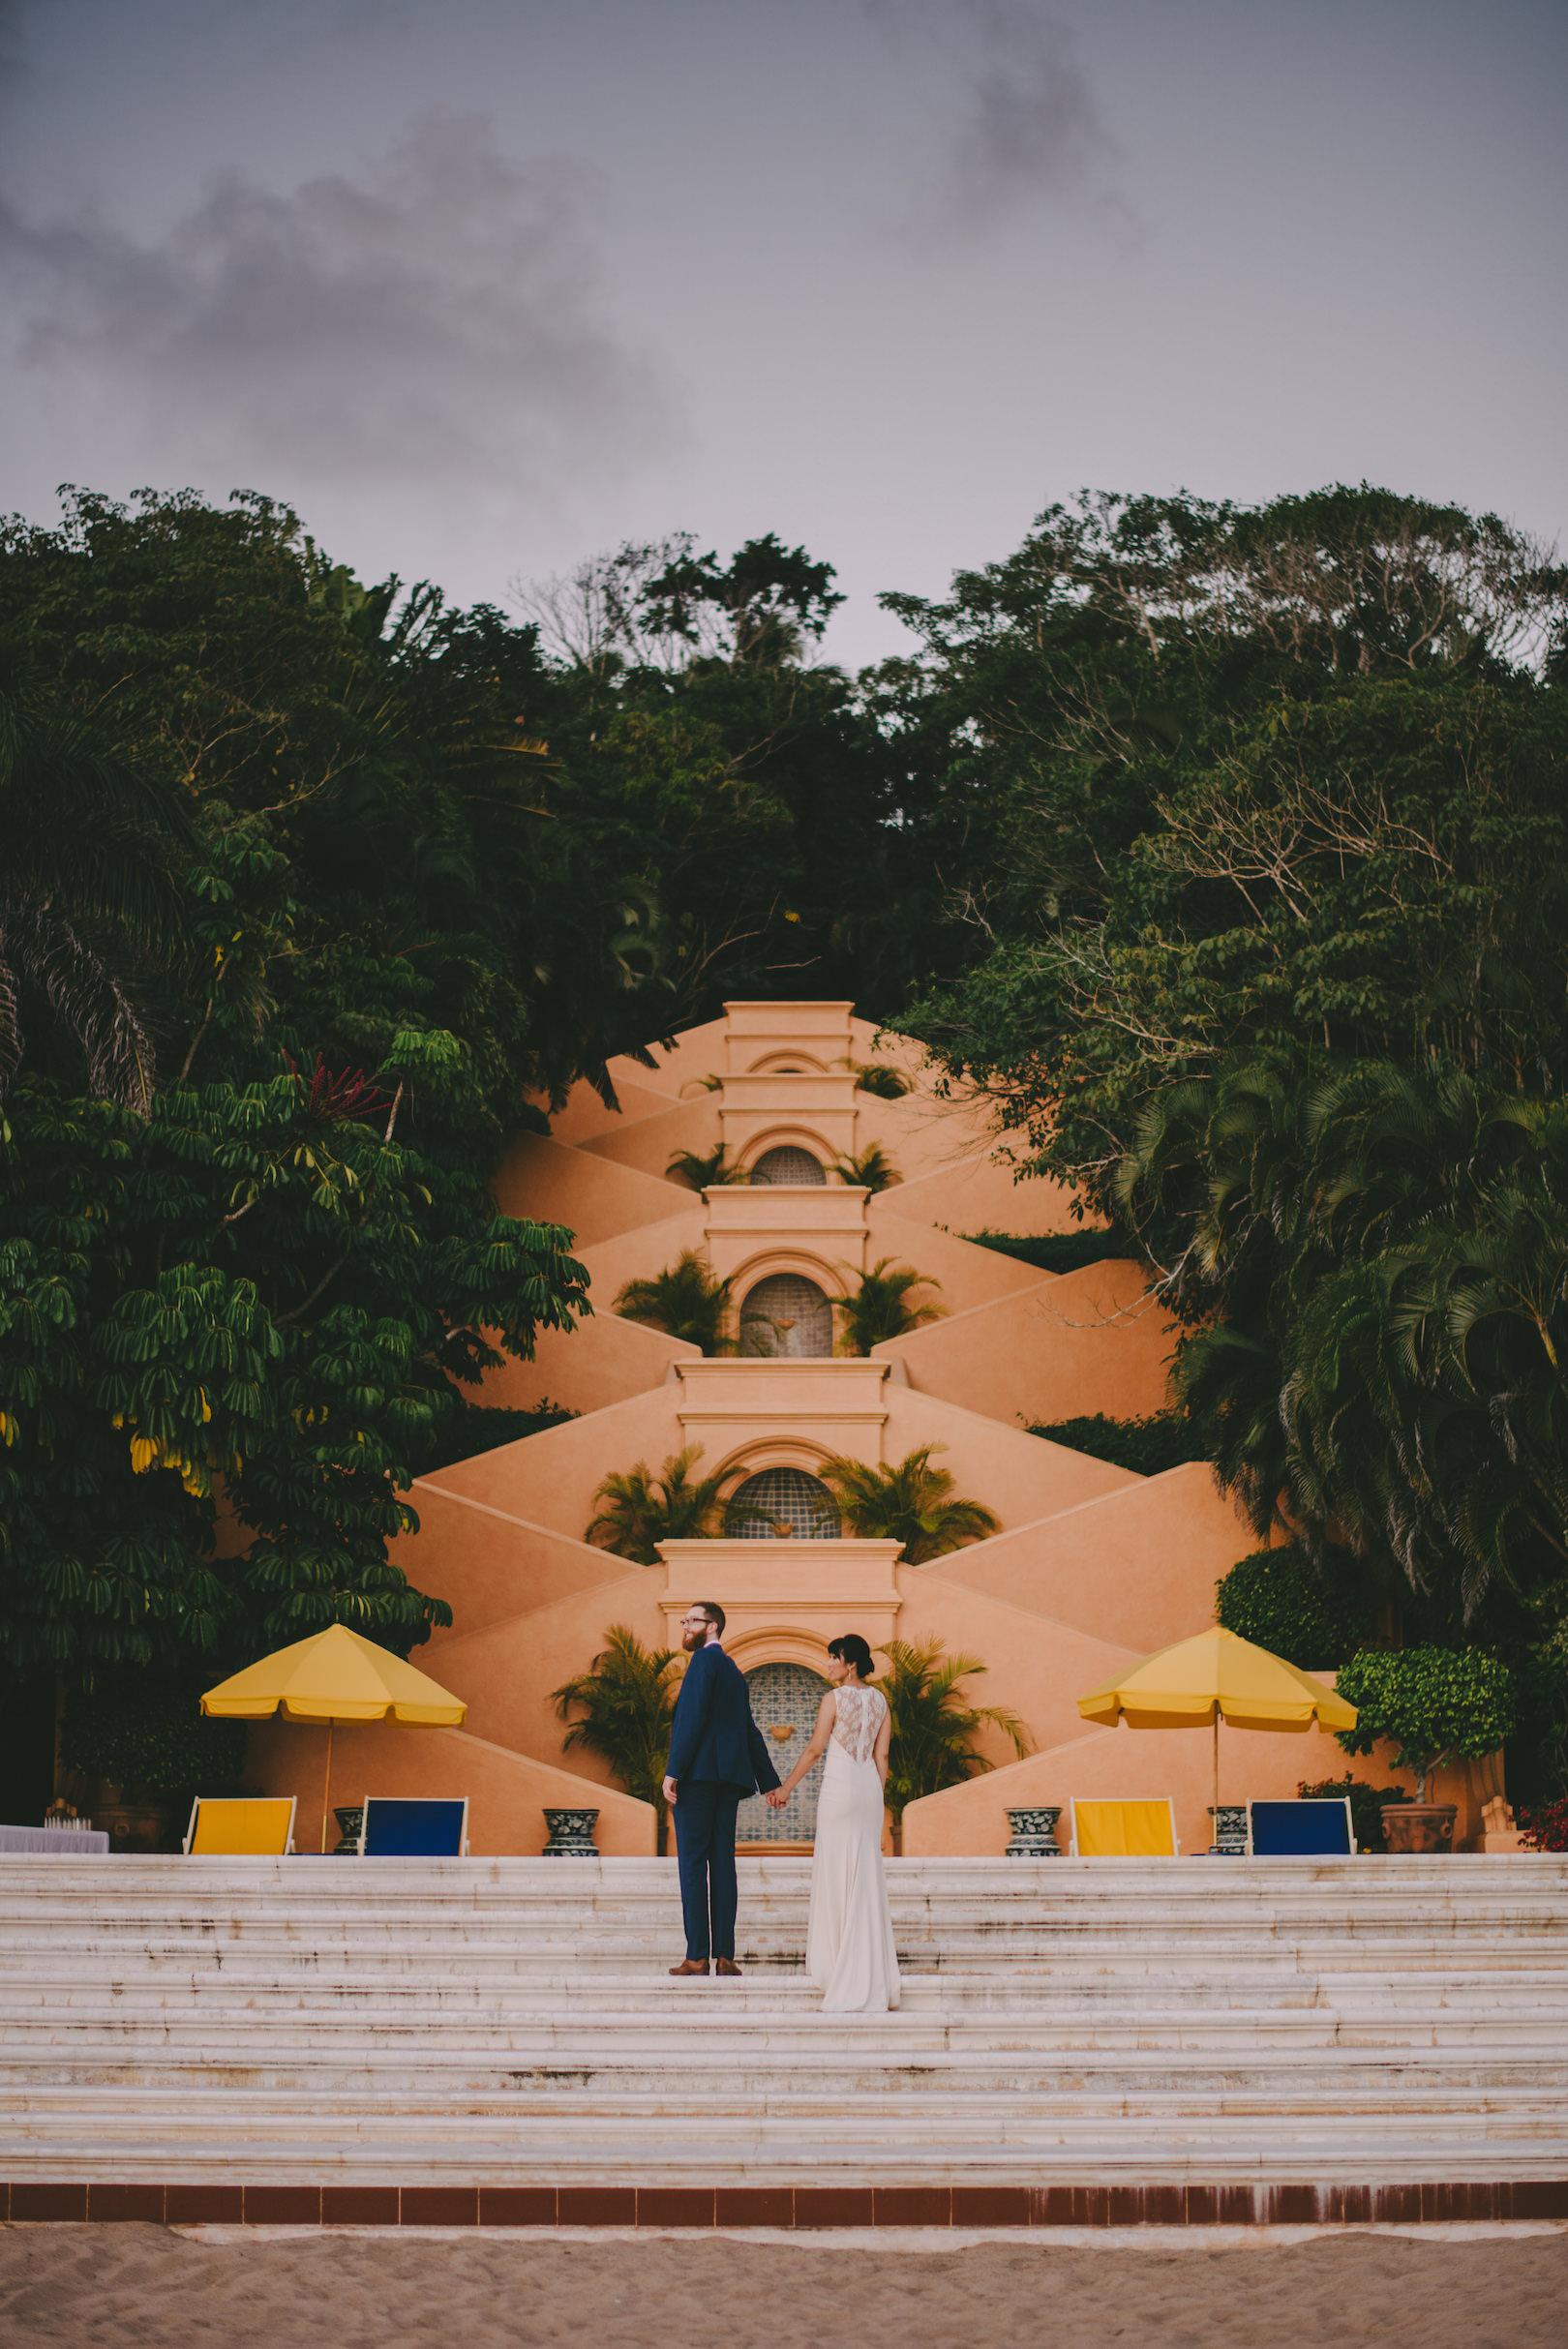 Nathan & Felicia - Wedding Day - © Dallas Kolotylo Photography - 630